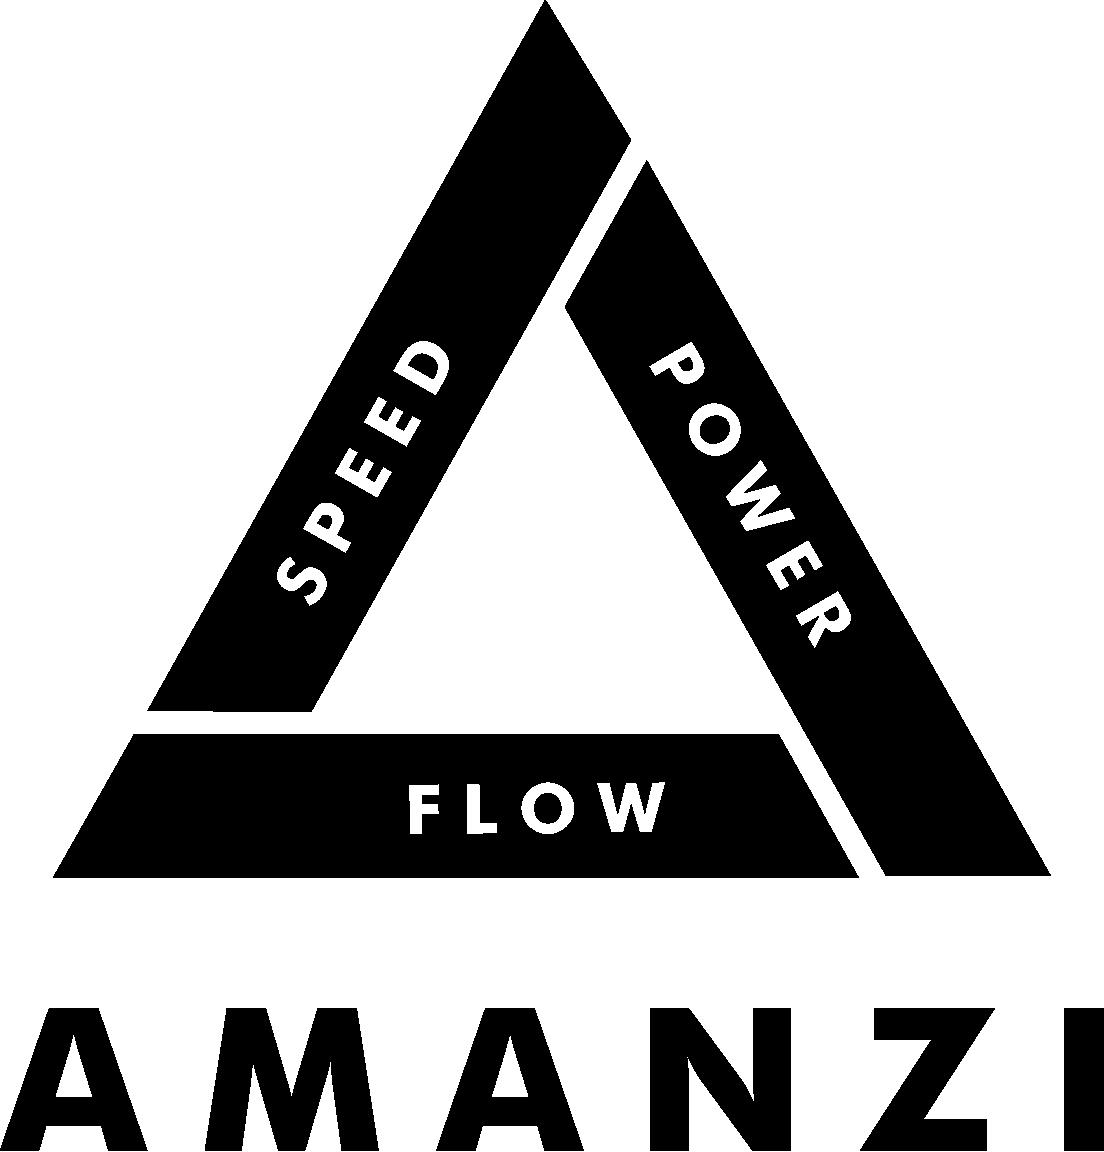 Amanzi logo